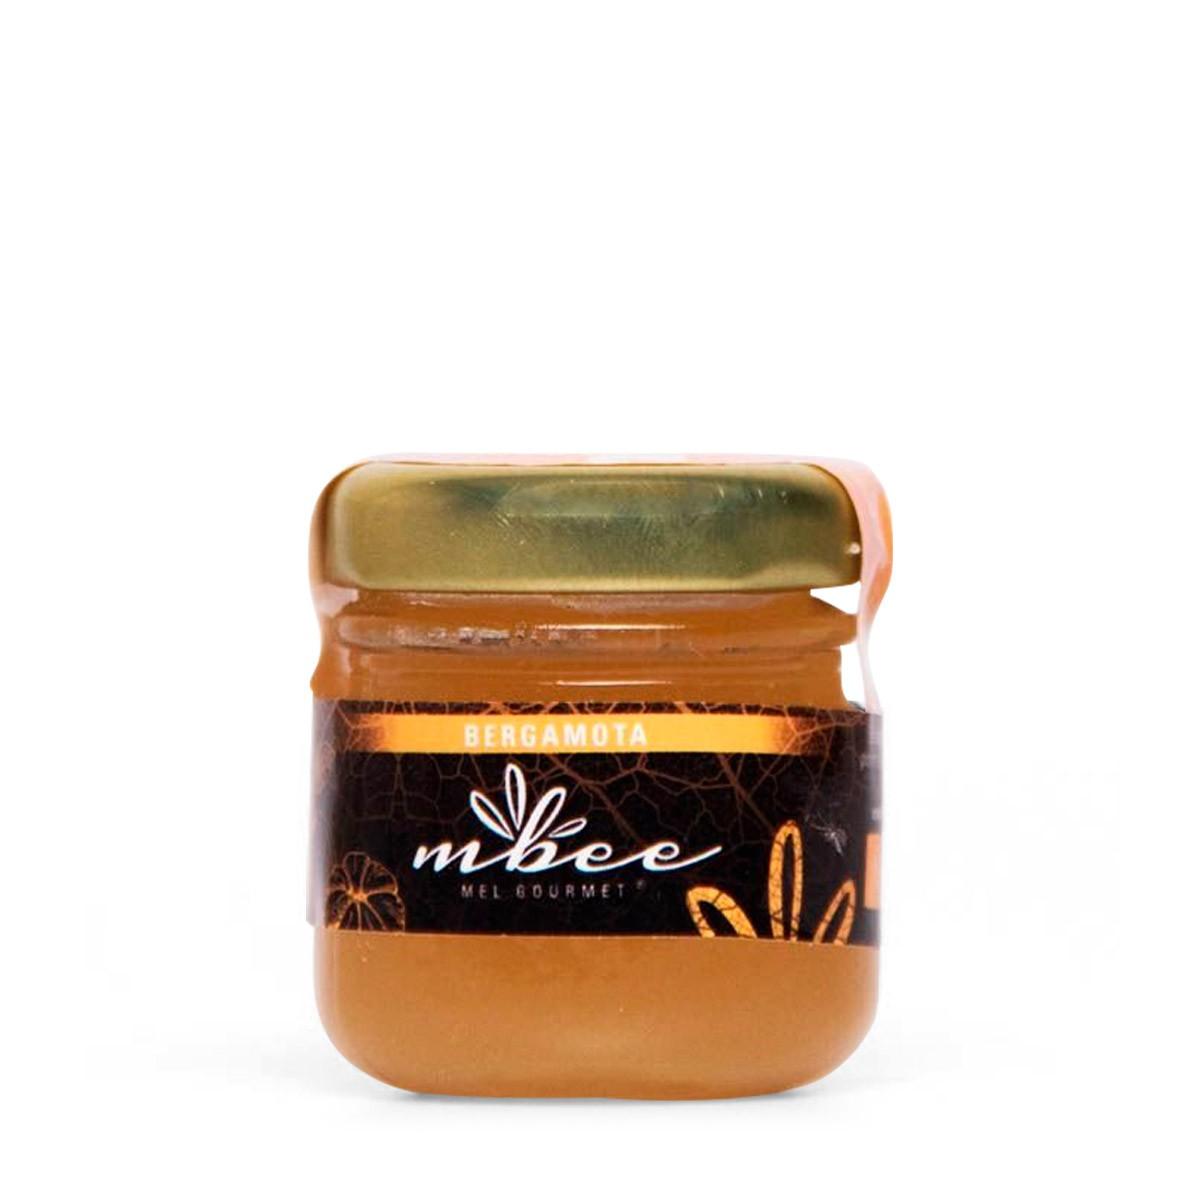 Mel Bergamota Aromas e Sabores Mbee 40g